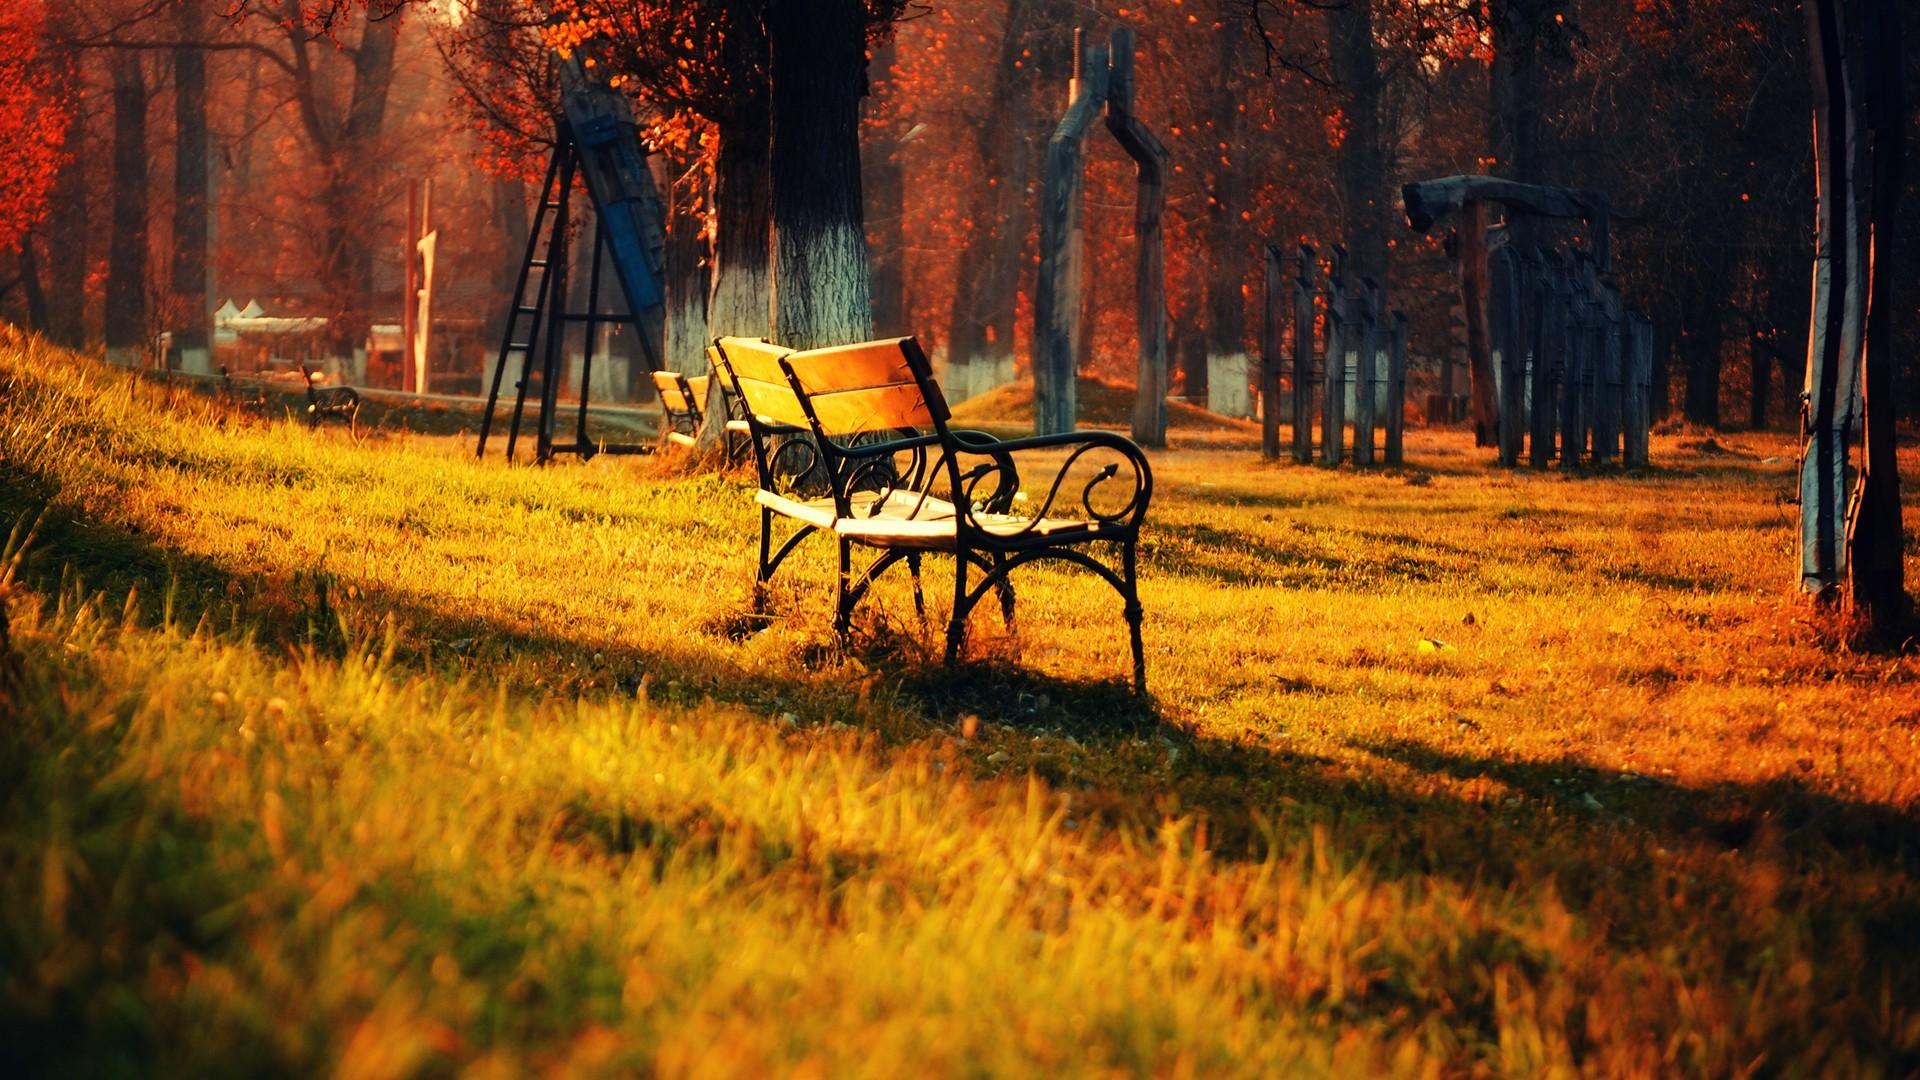 Park Trees Sunset Sunrise Bench Wallpaper Hd 1080p Nature Green – 1920×1080